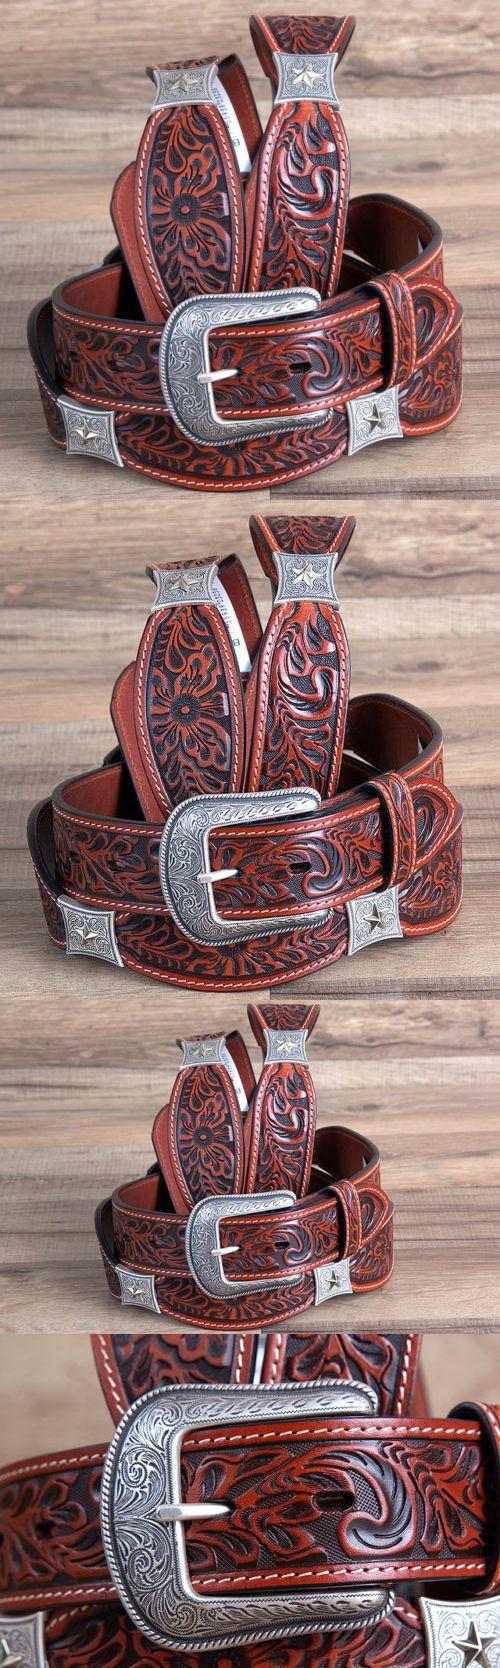 Baseball Belts 181334: 42 3D 1 3 4 Cognac Brown Floral Leather Mens Cowboy Western Fashion Belt -> BUY IT NOW ONLY: $54.99 on eBay!